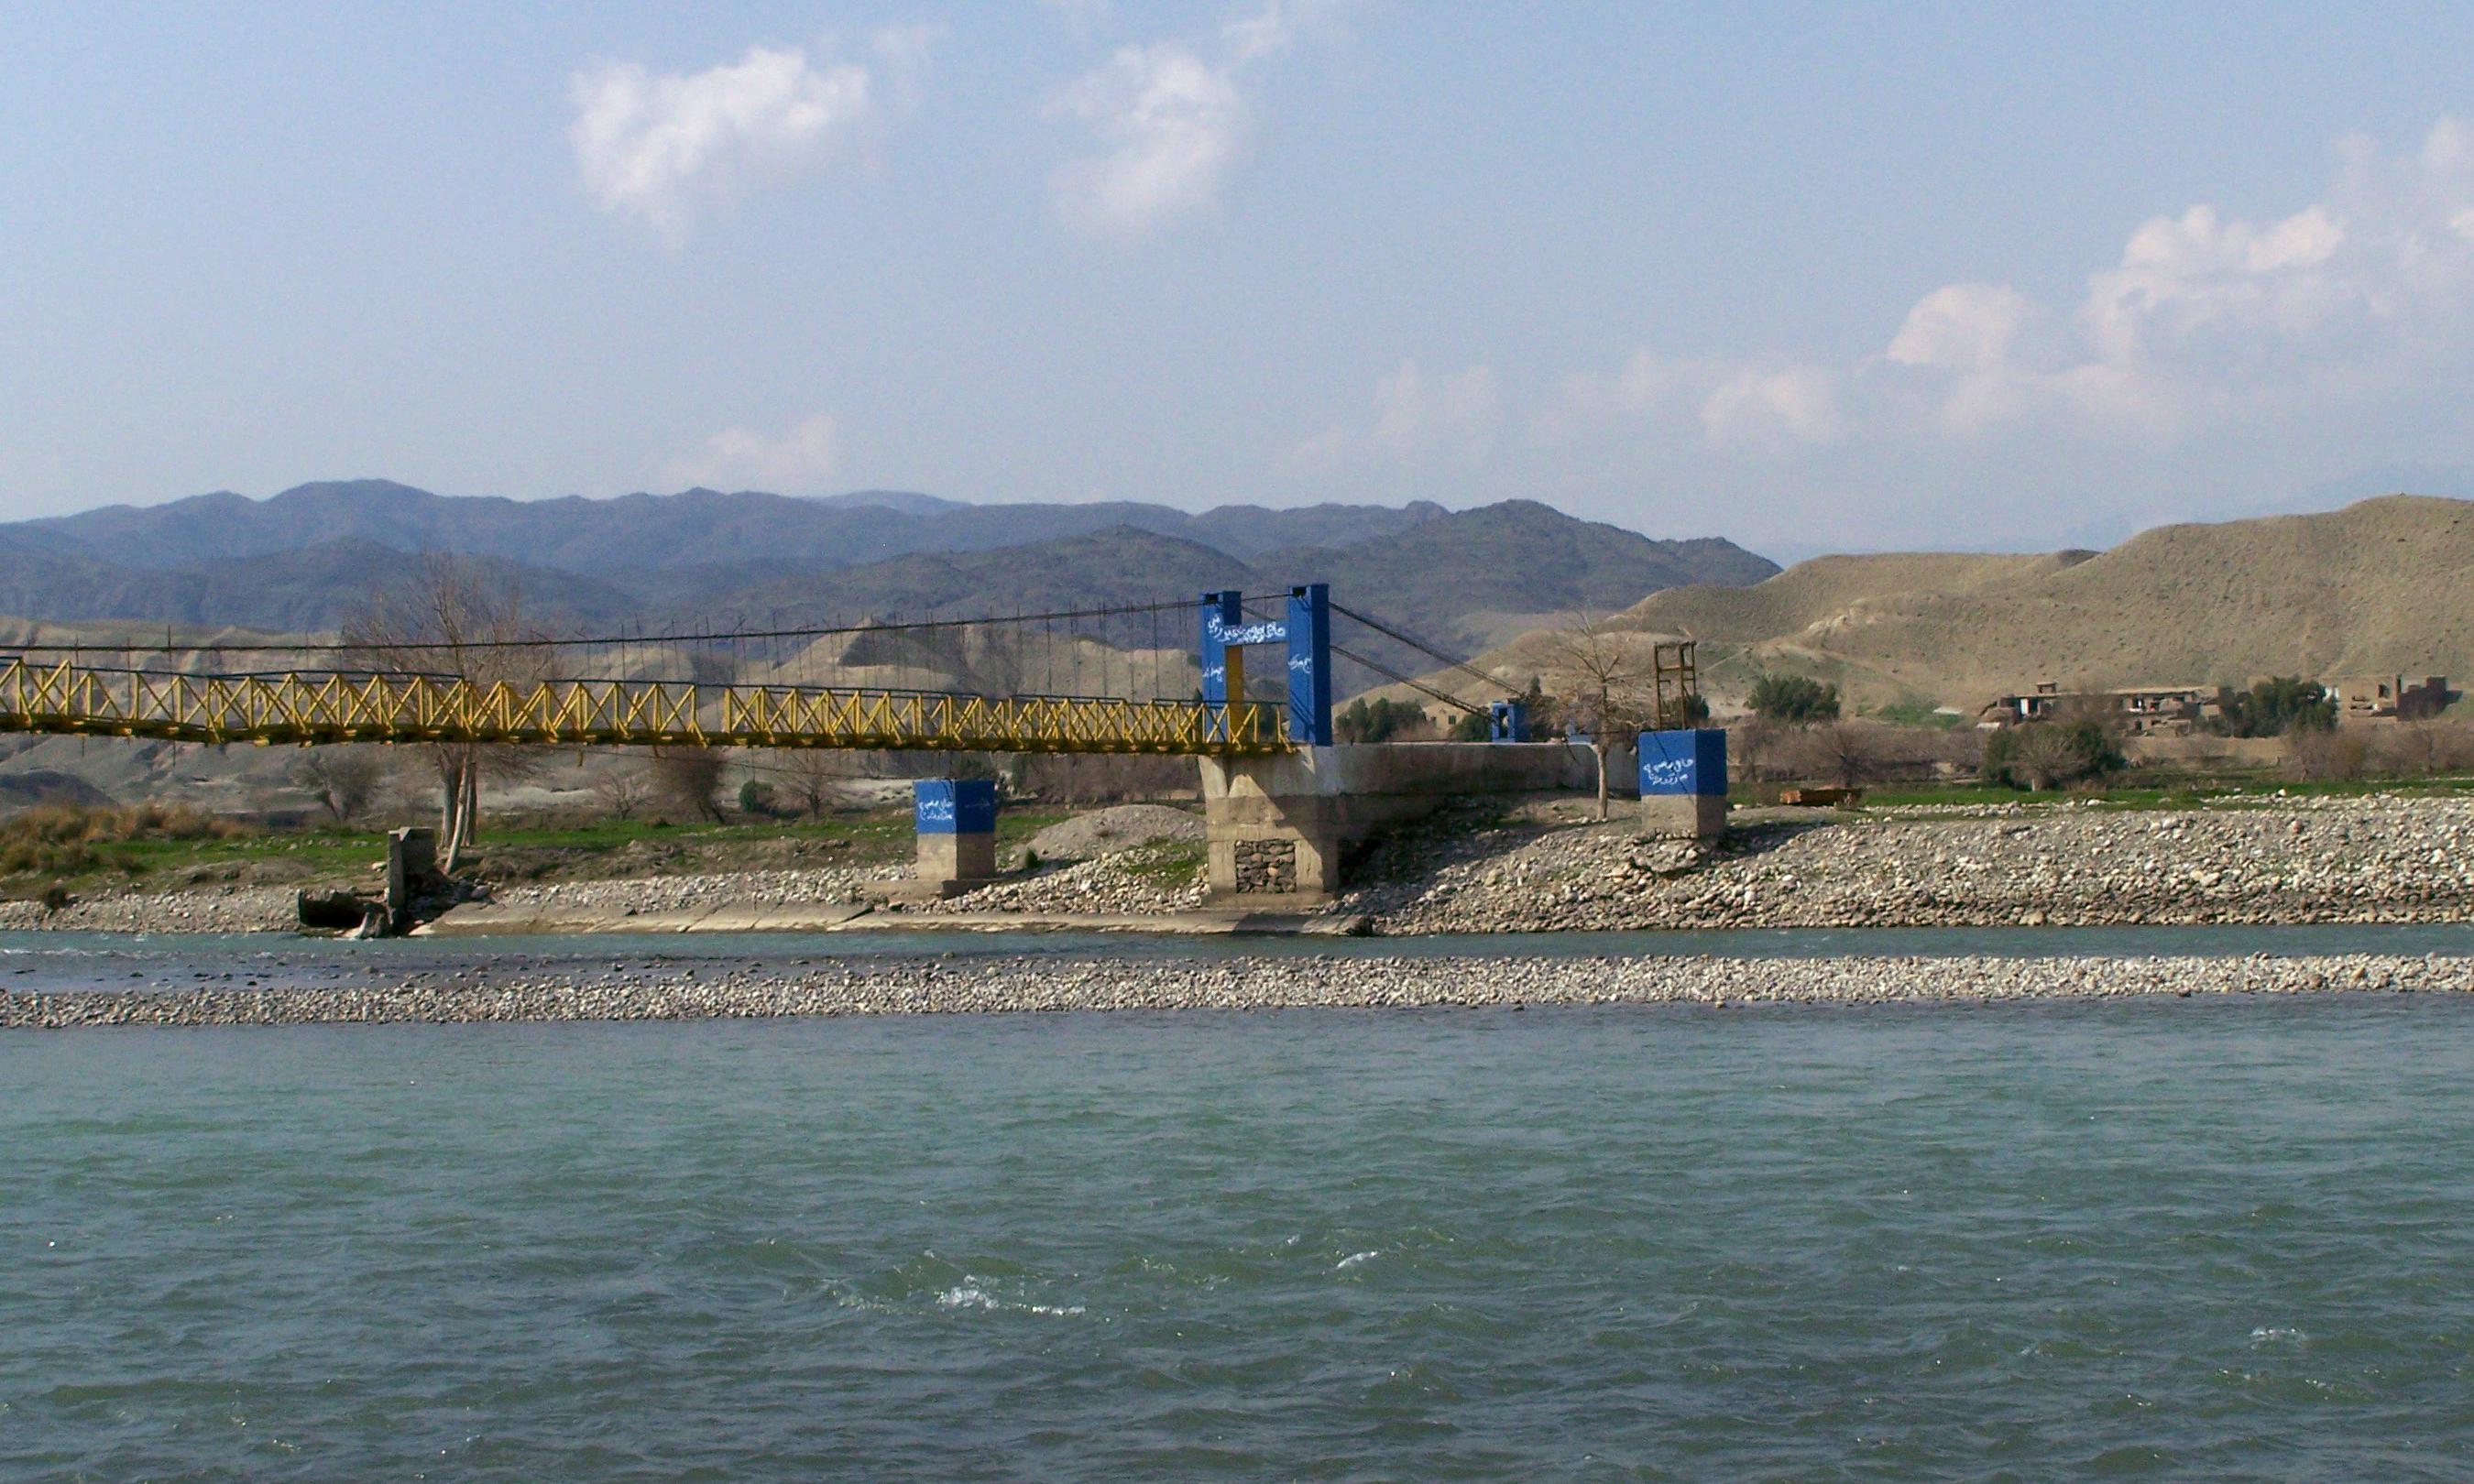 Description kabul river bridge 2